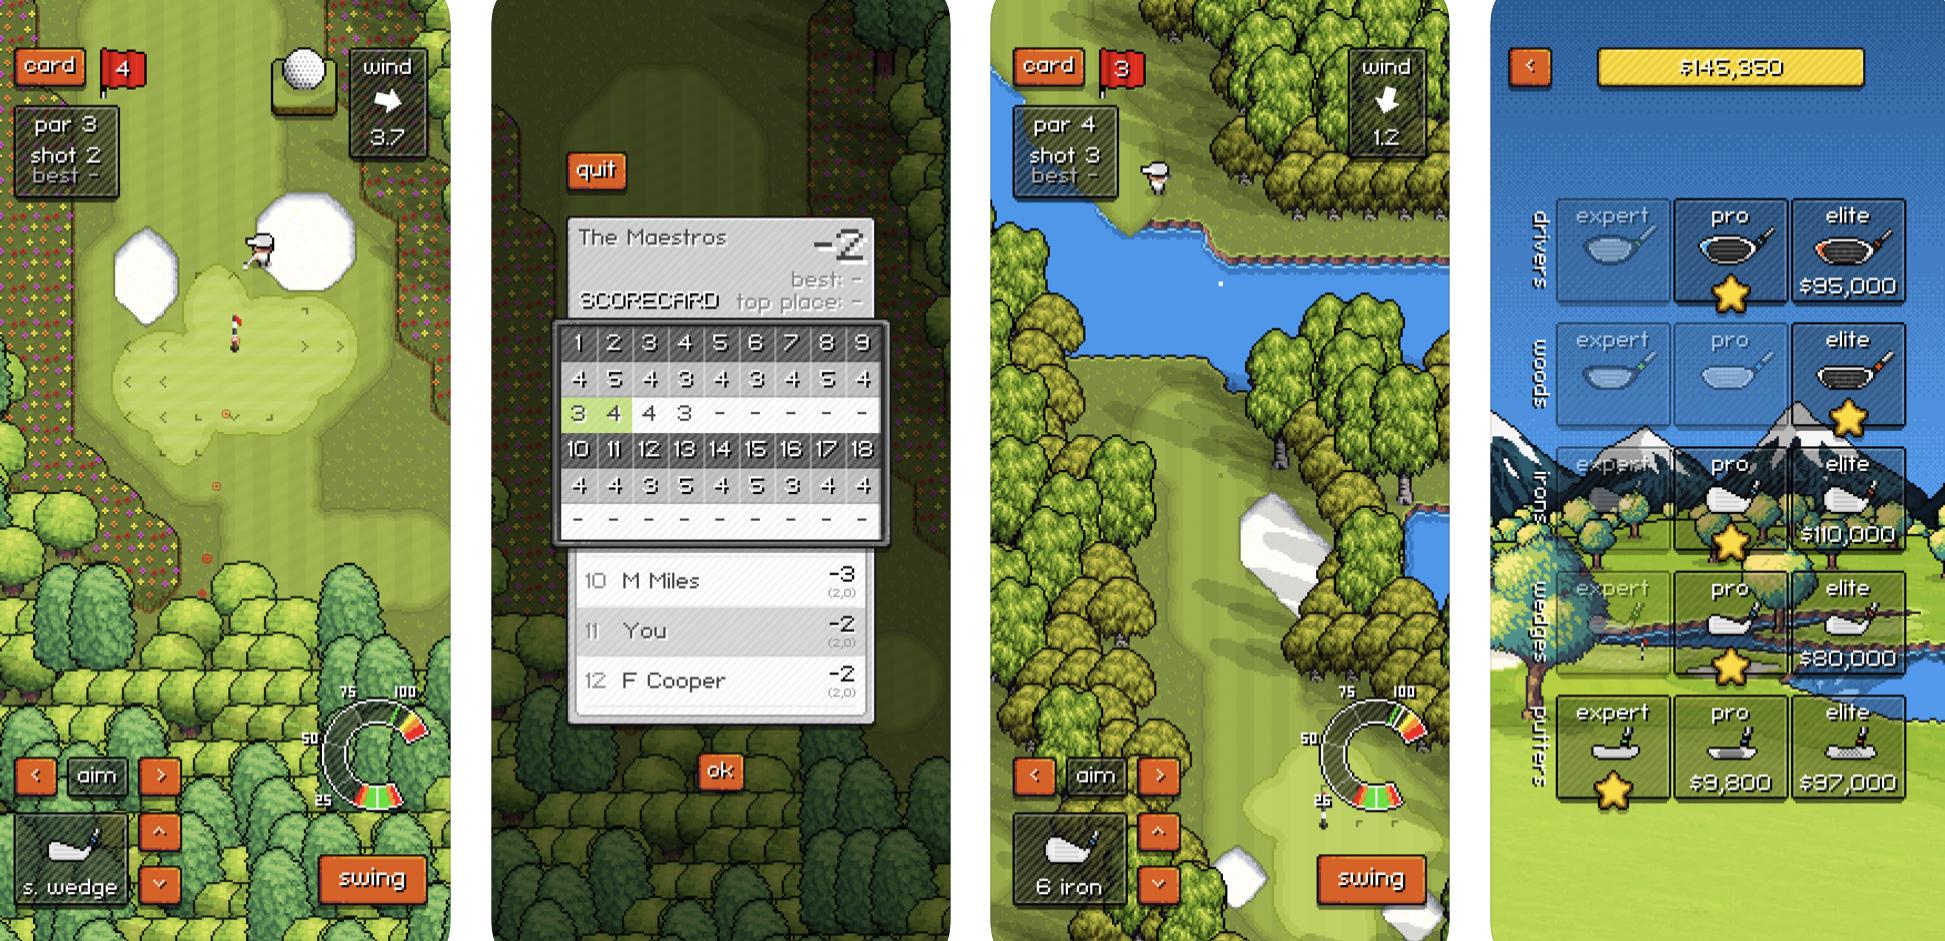 pixel-pro-golf